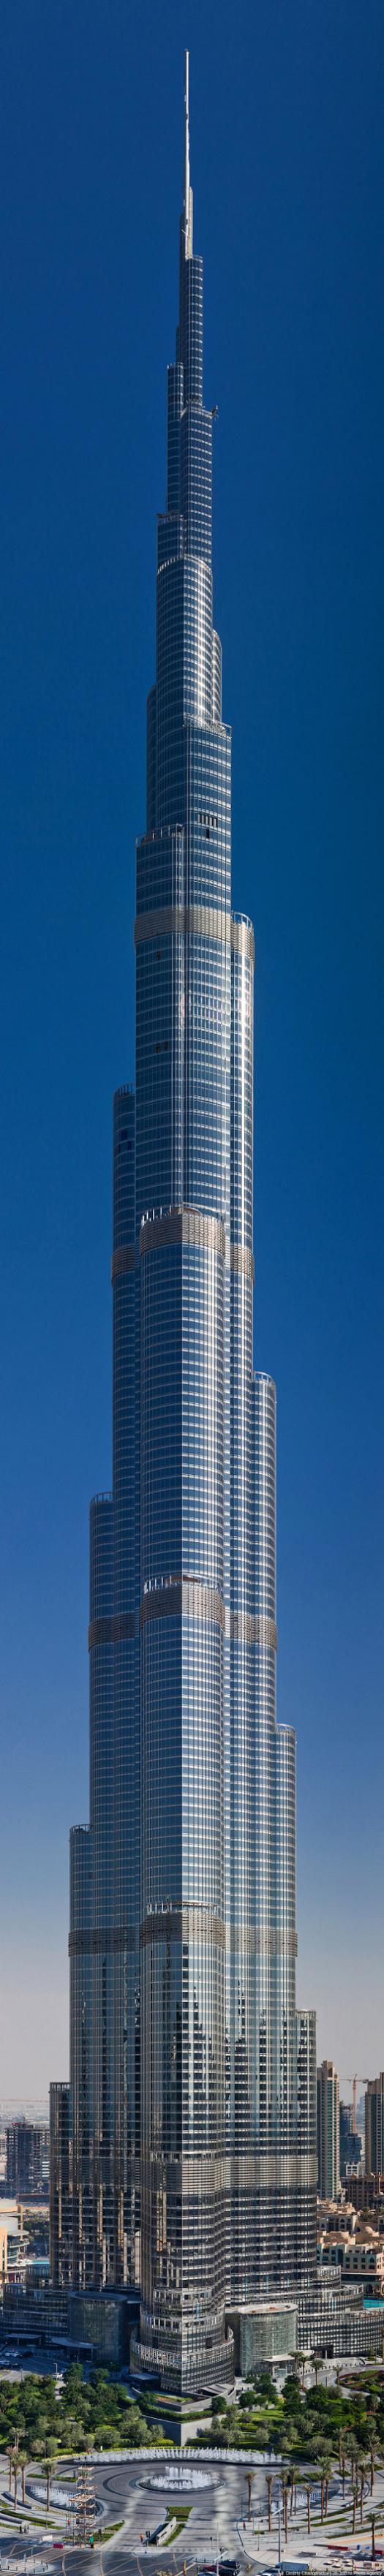 небоскреб в дубае бурдж халифа квартира